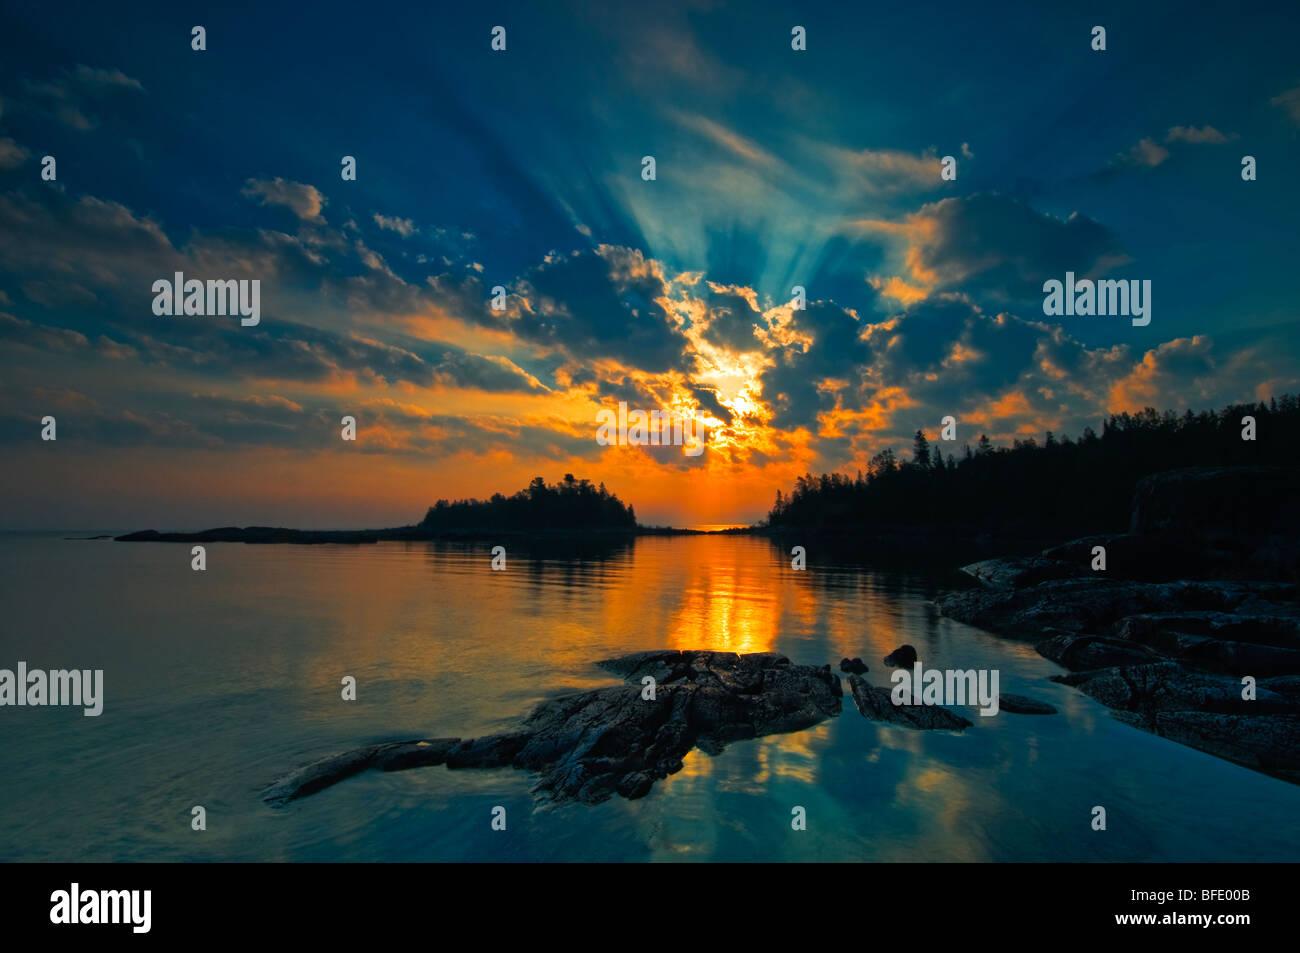 Sunrise on Georgian Bay at Burnt Point, Fathom Five National Marine Park, Ontario, Canada - Stock Image